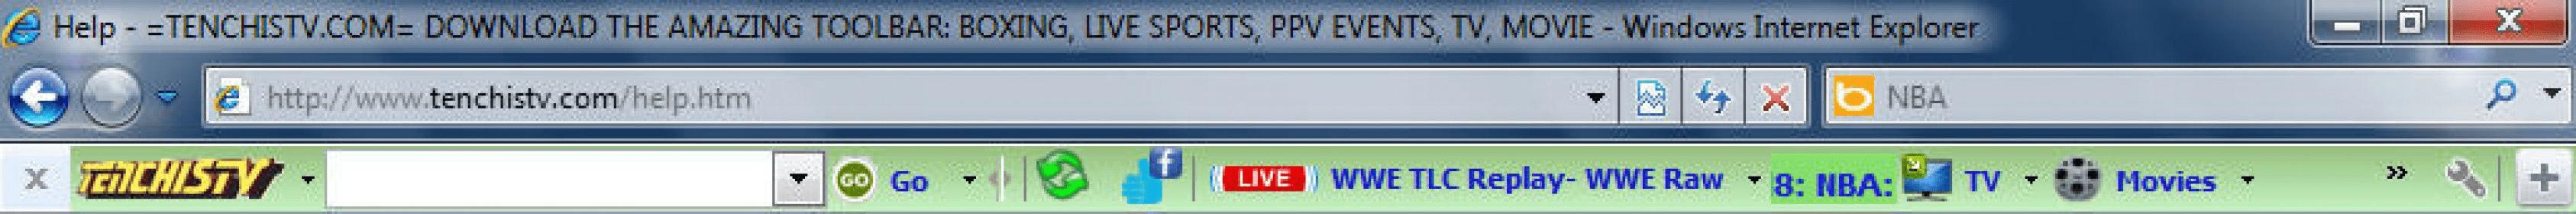 toolbar tv ecuador deportes